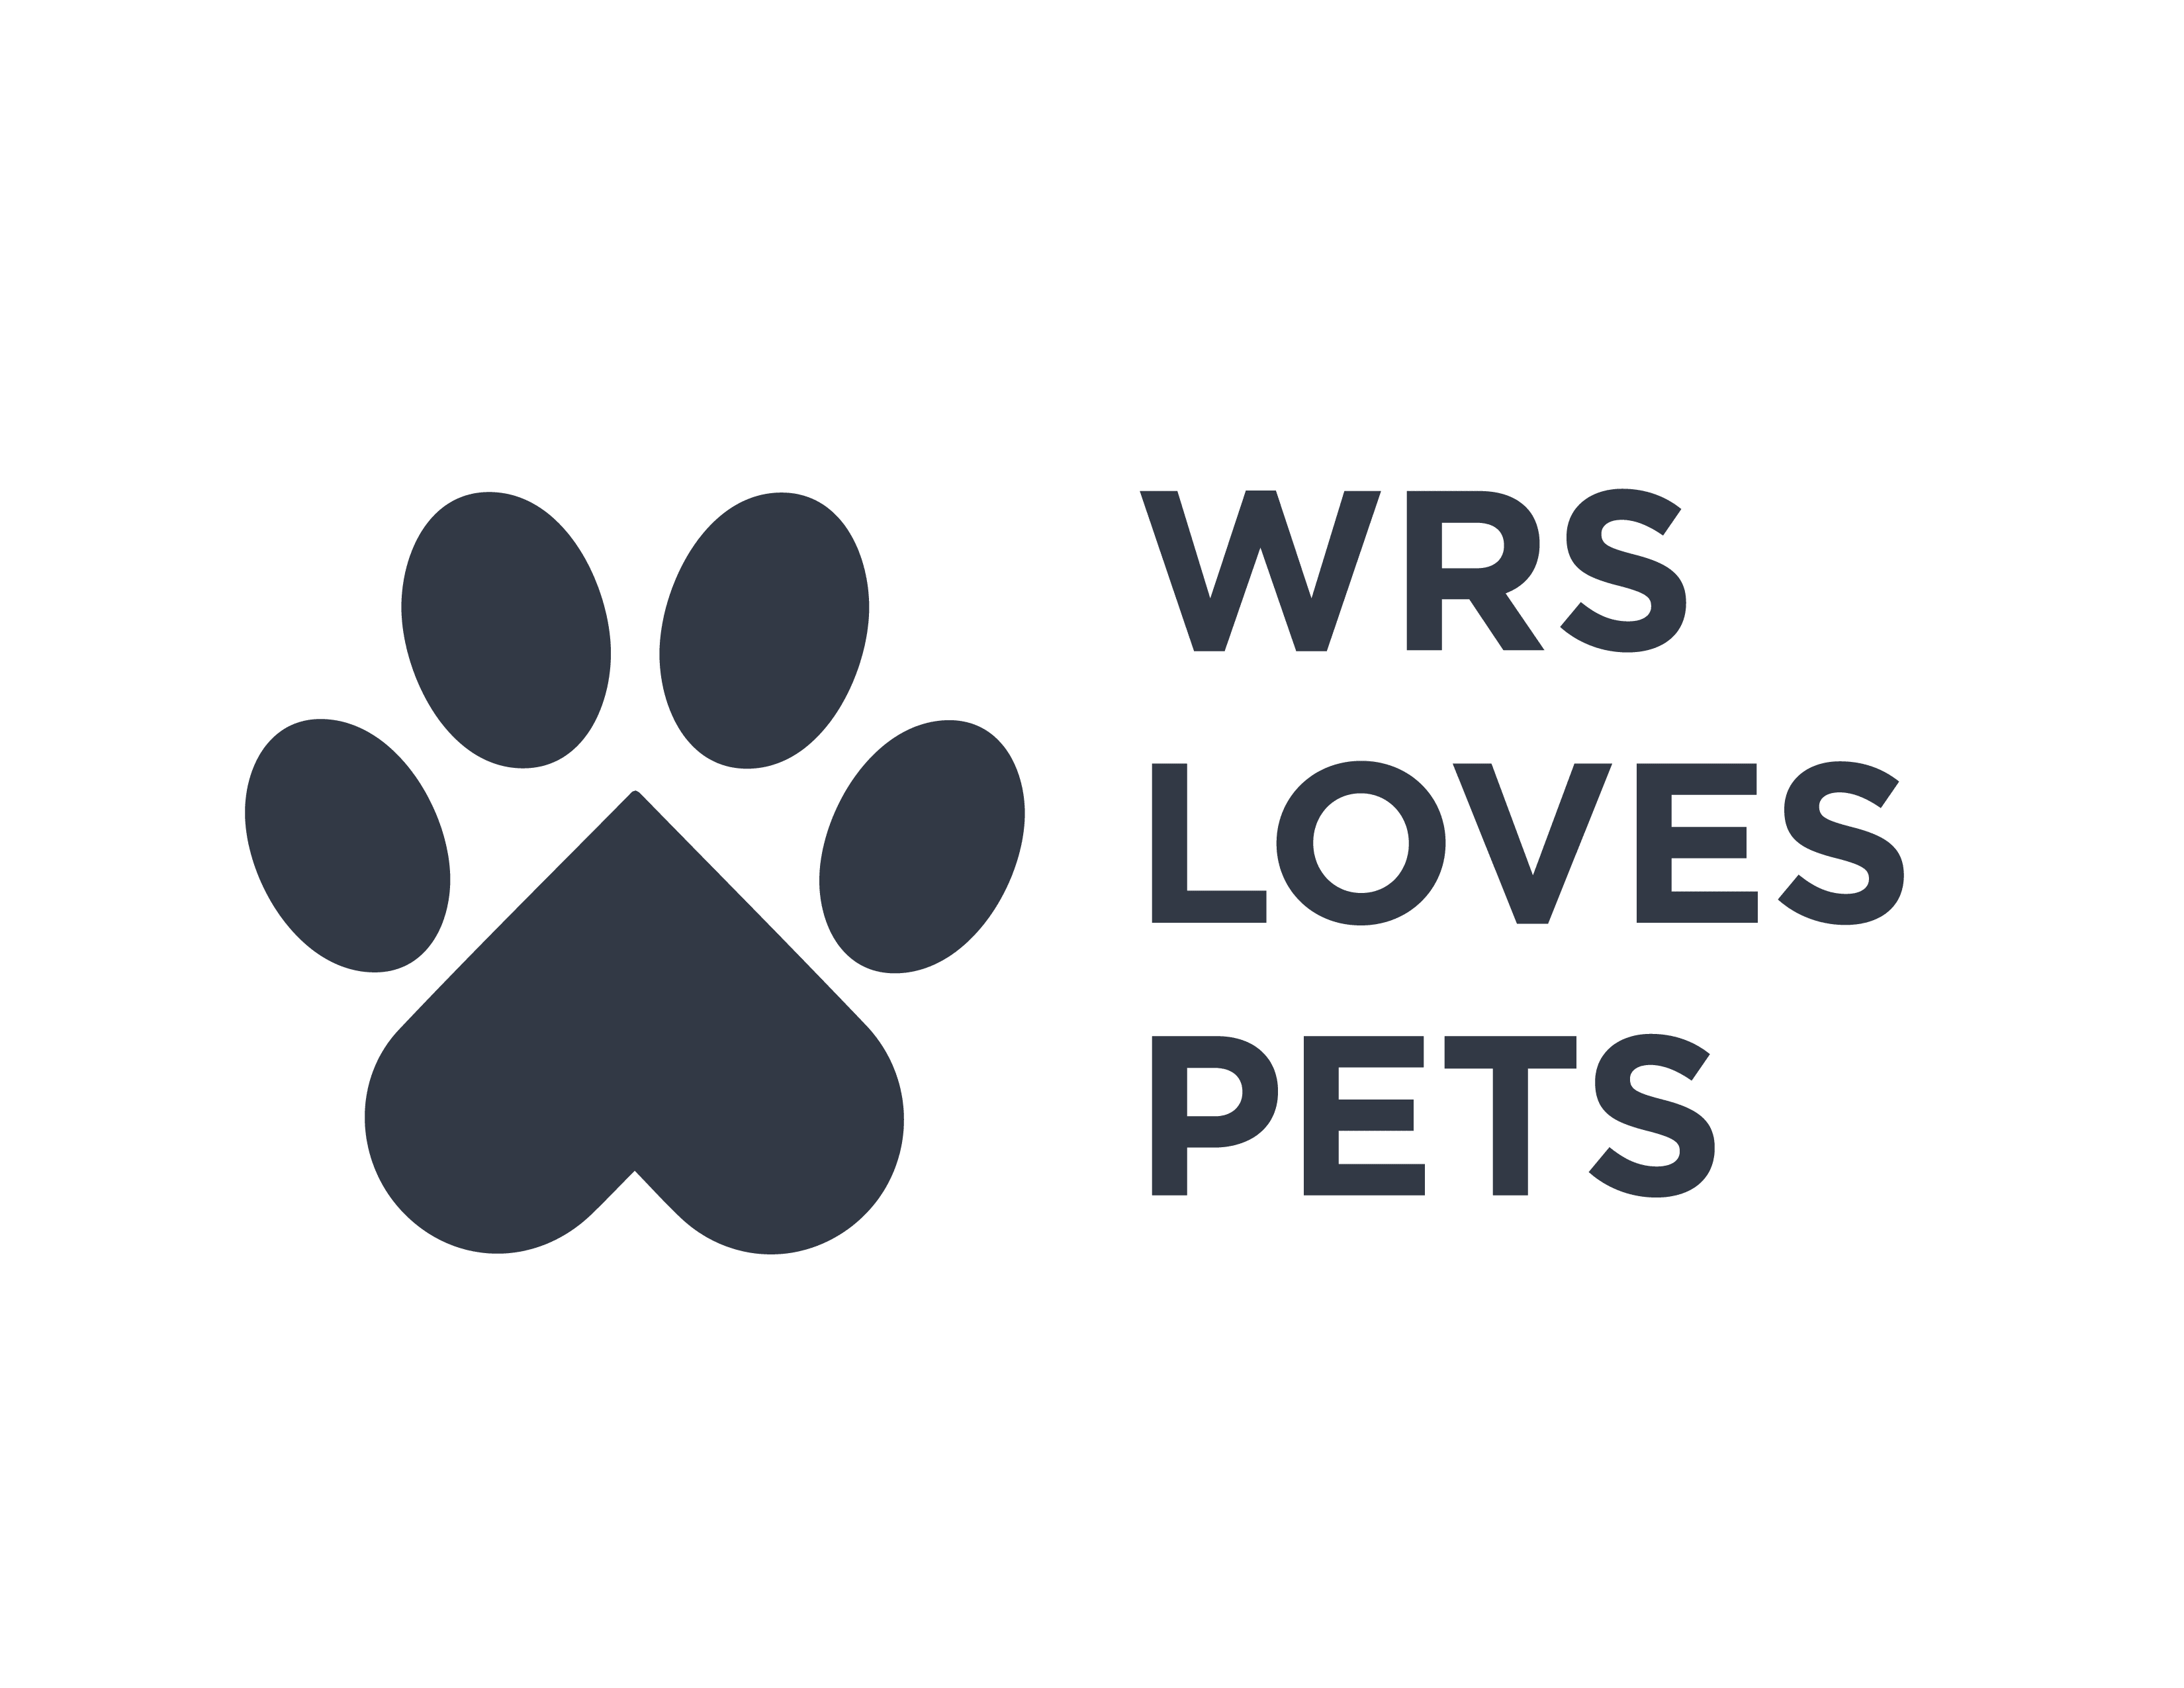 WRS Loves Pets